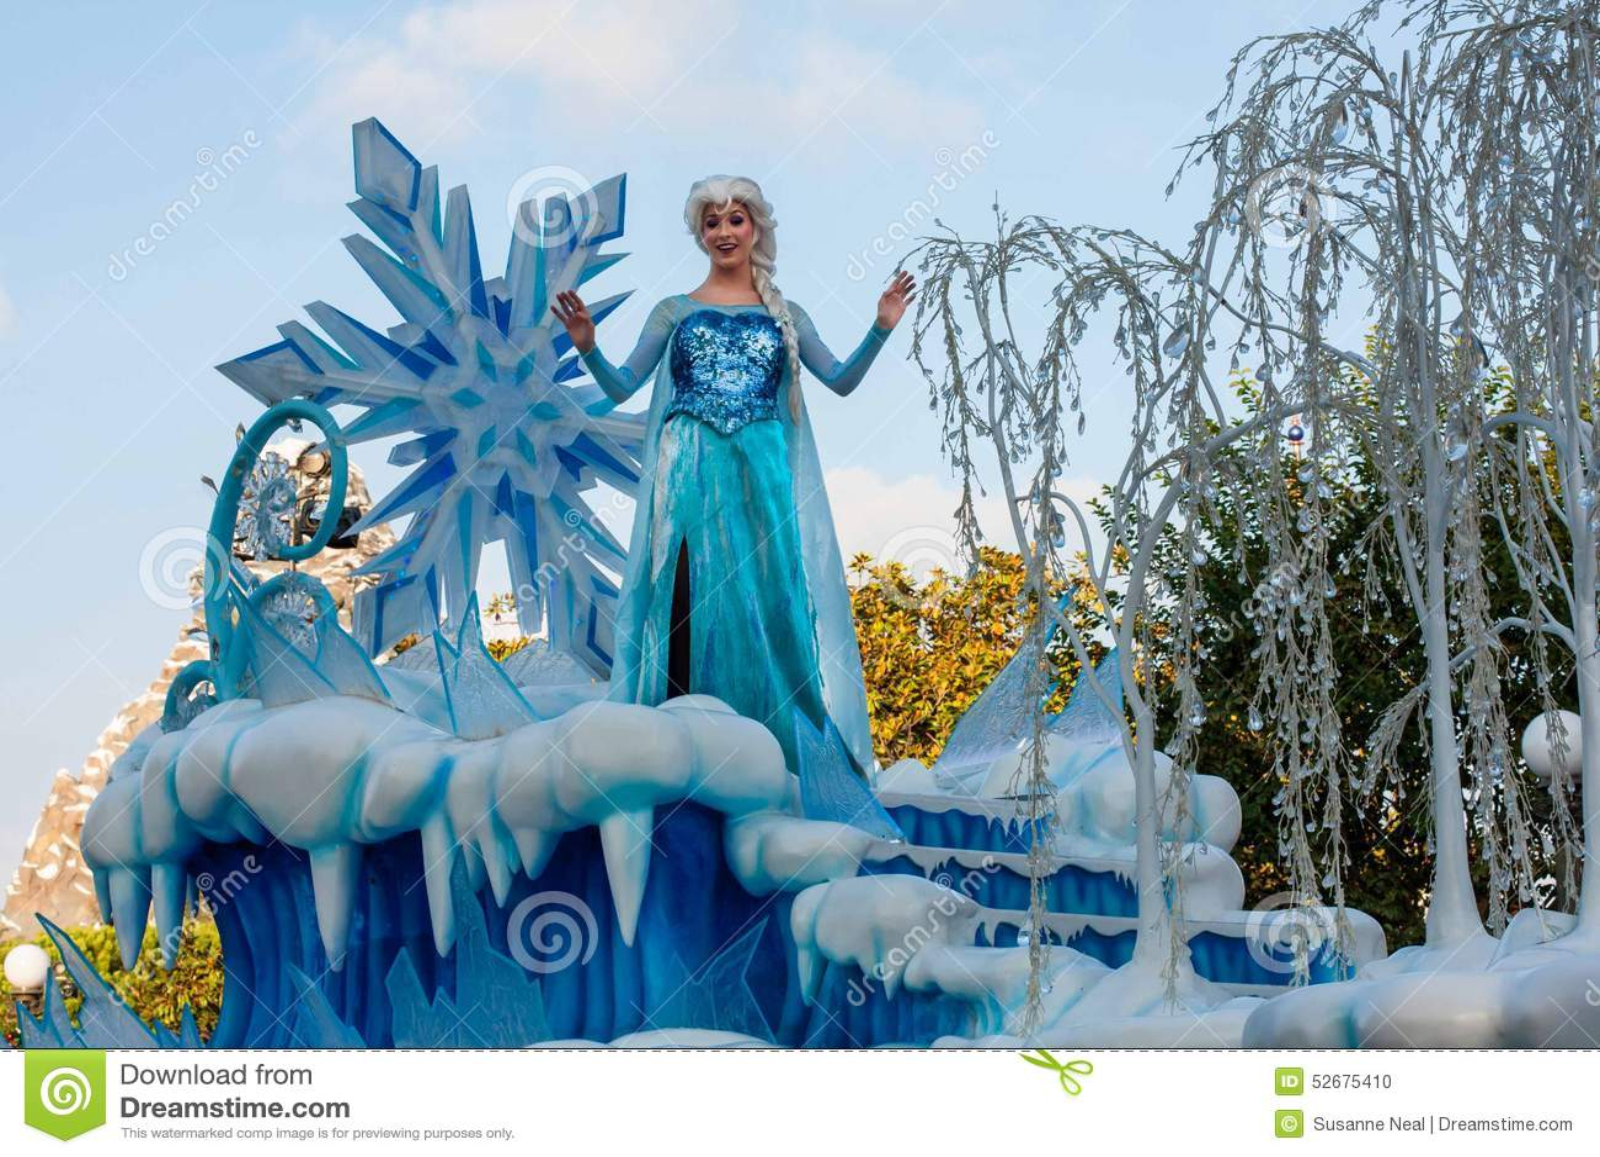 Elsa Of Frozen Fame On Float In Disneyland Parade Editorial Image